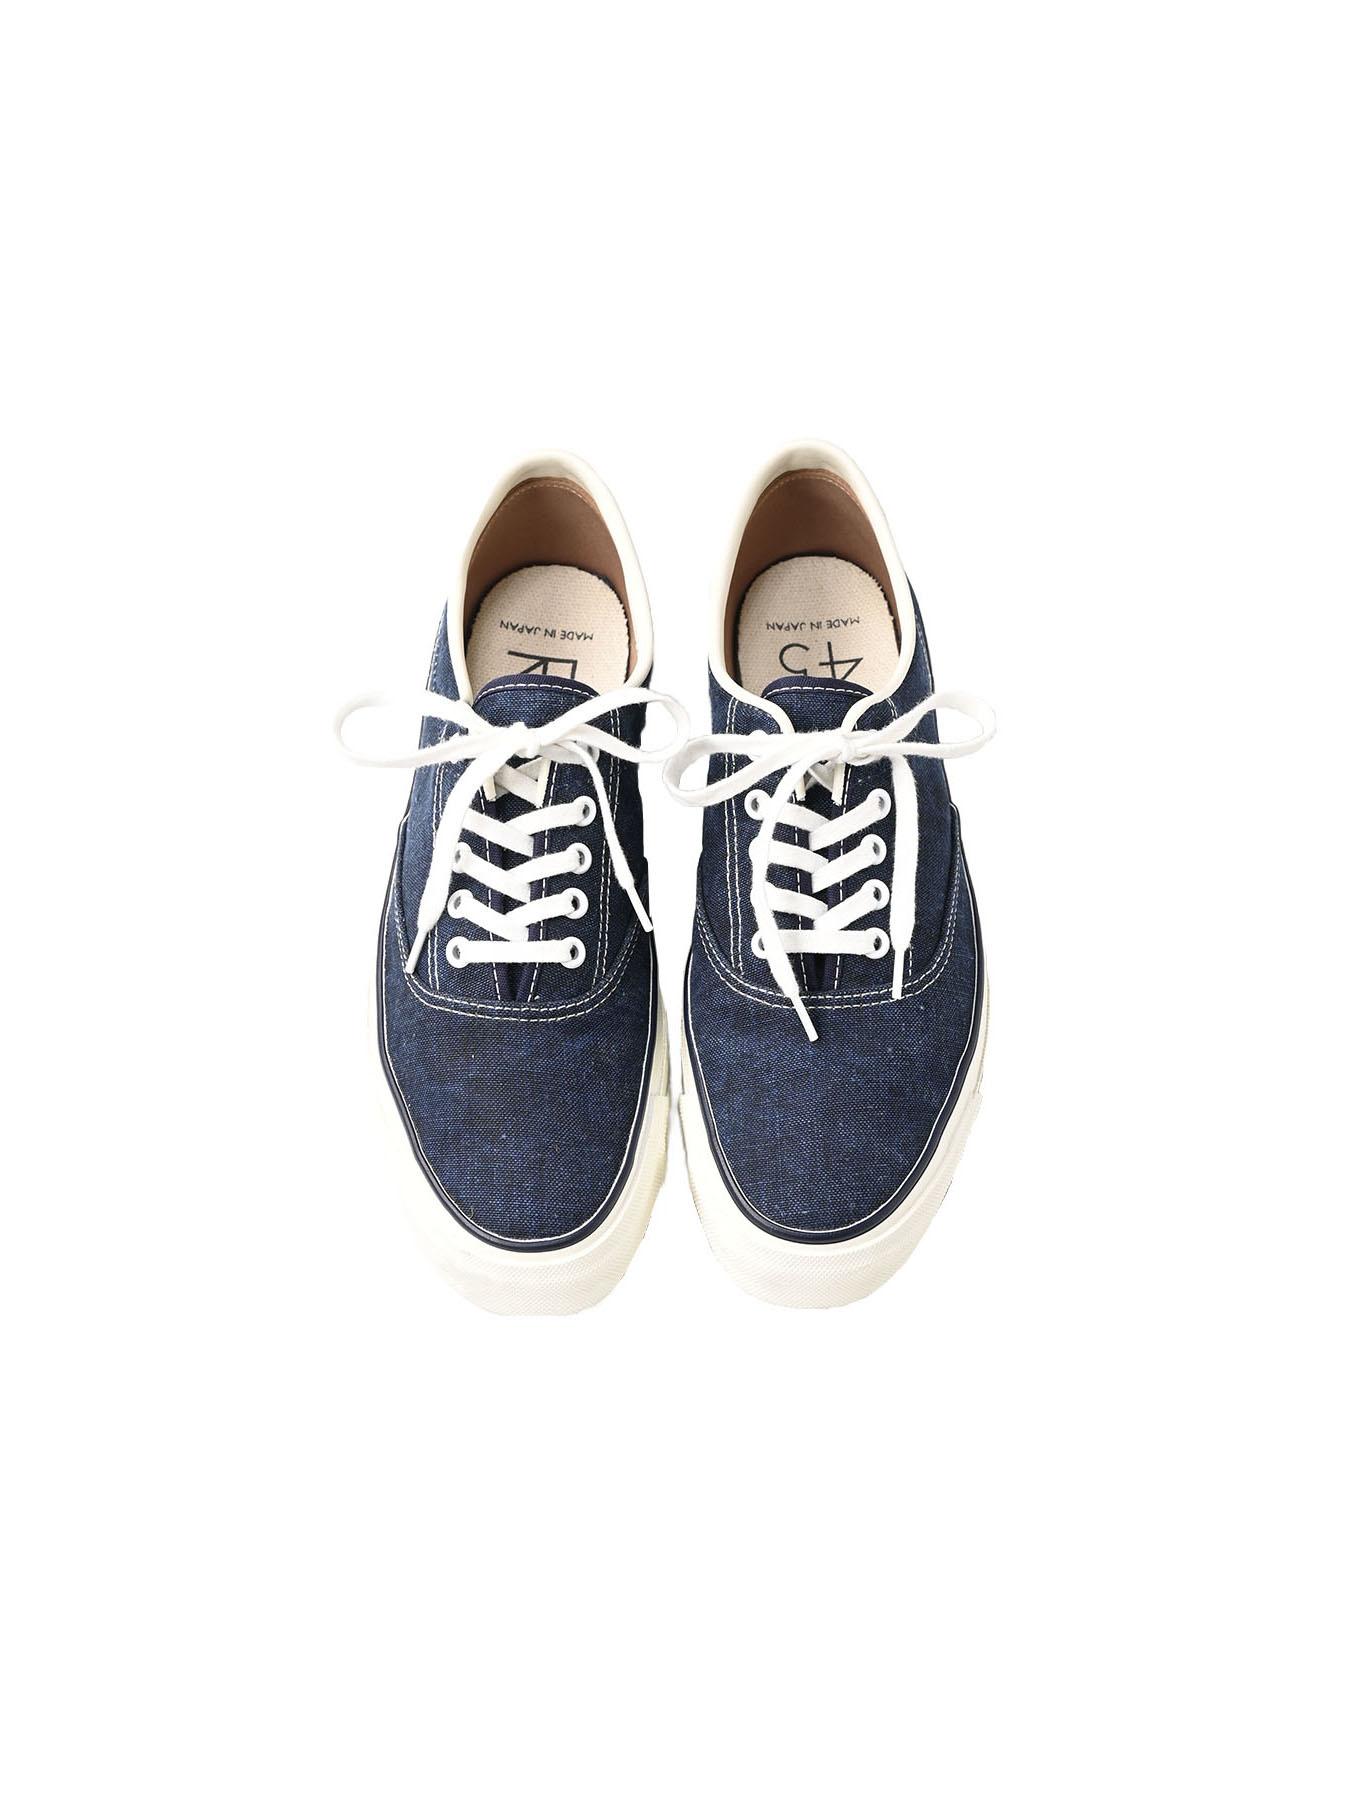 Indigo Linen Duck Sneaker size 5.5-7.5 UK-1